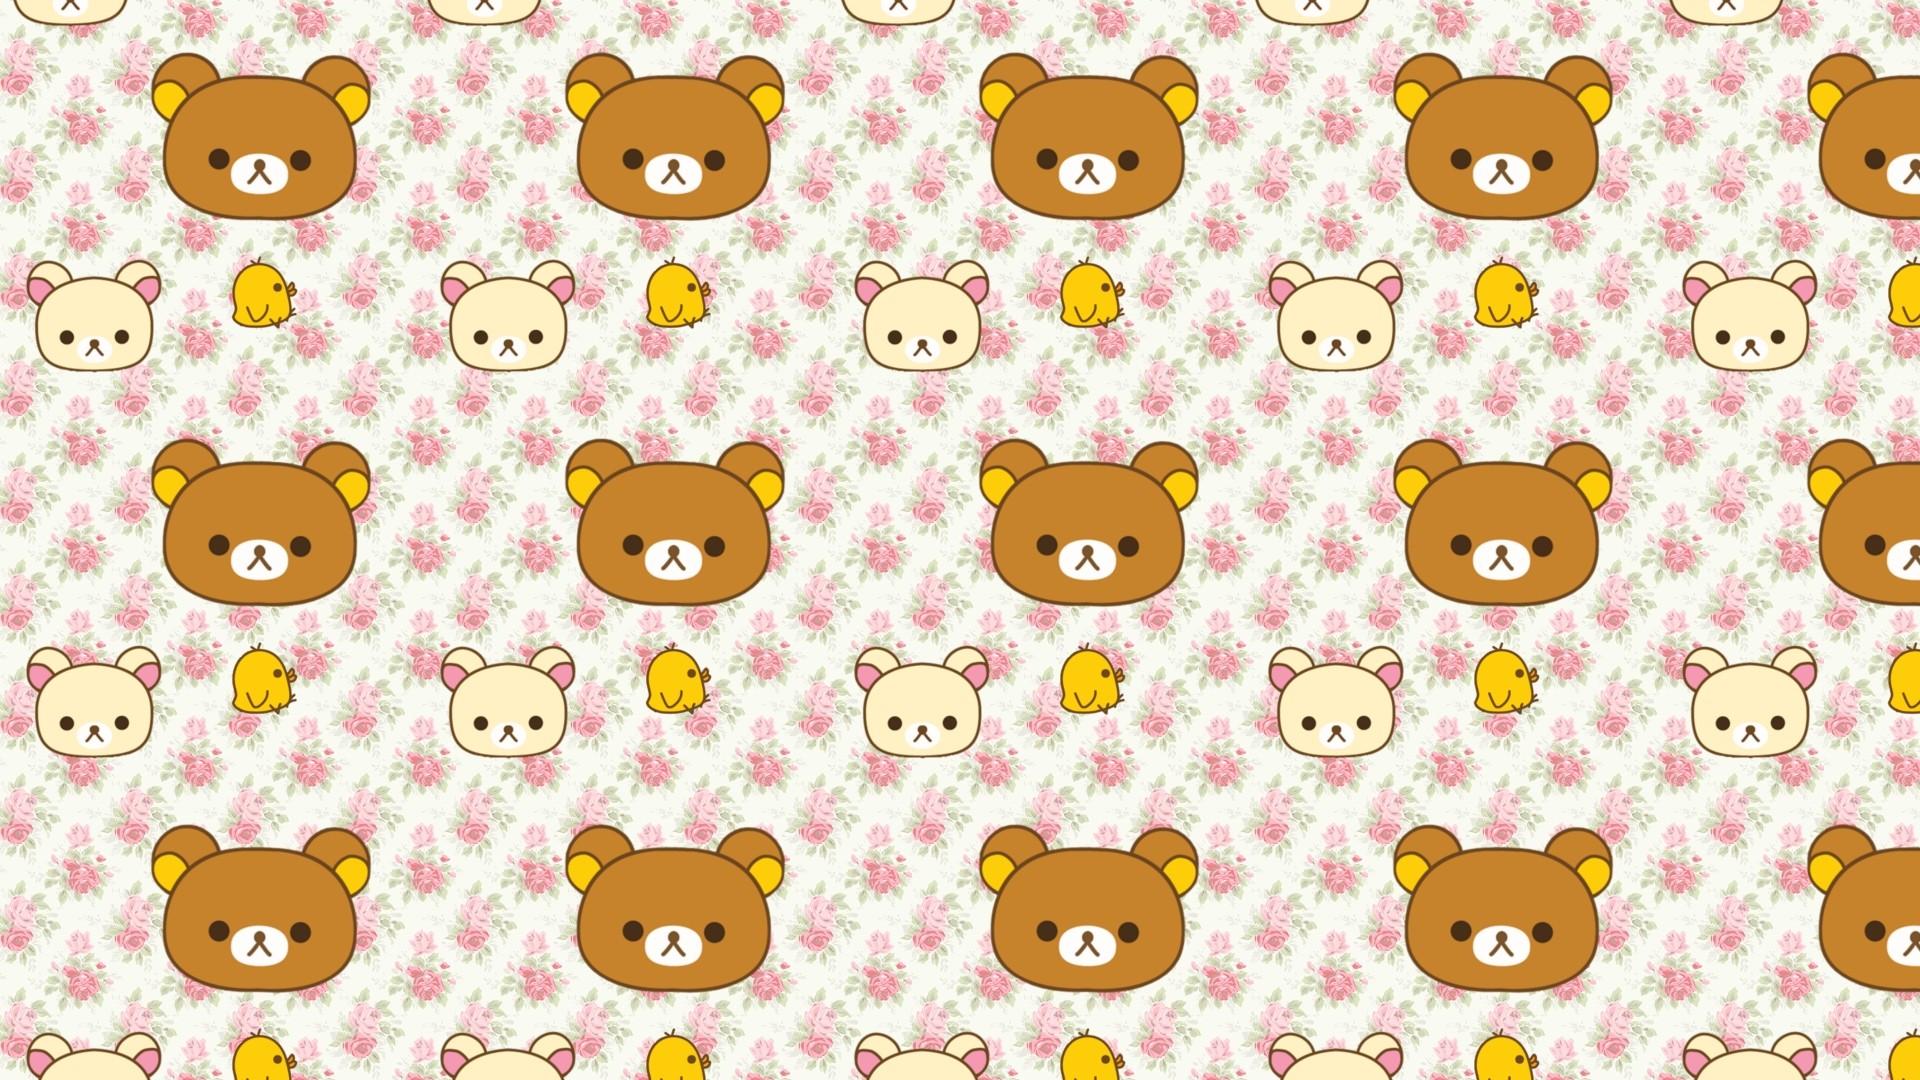 Kawaii Tare Panda Wallpaper ·â'